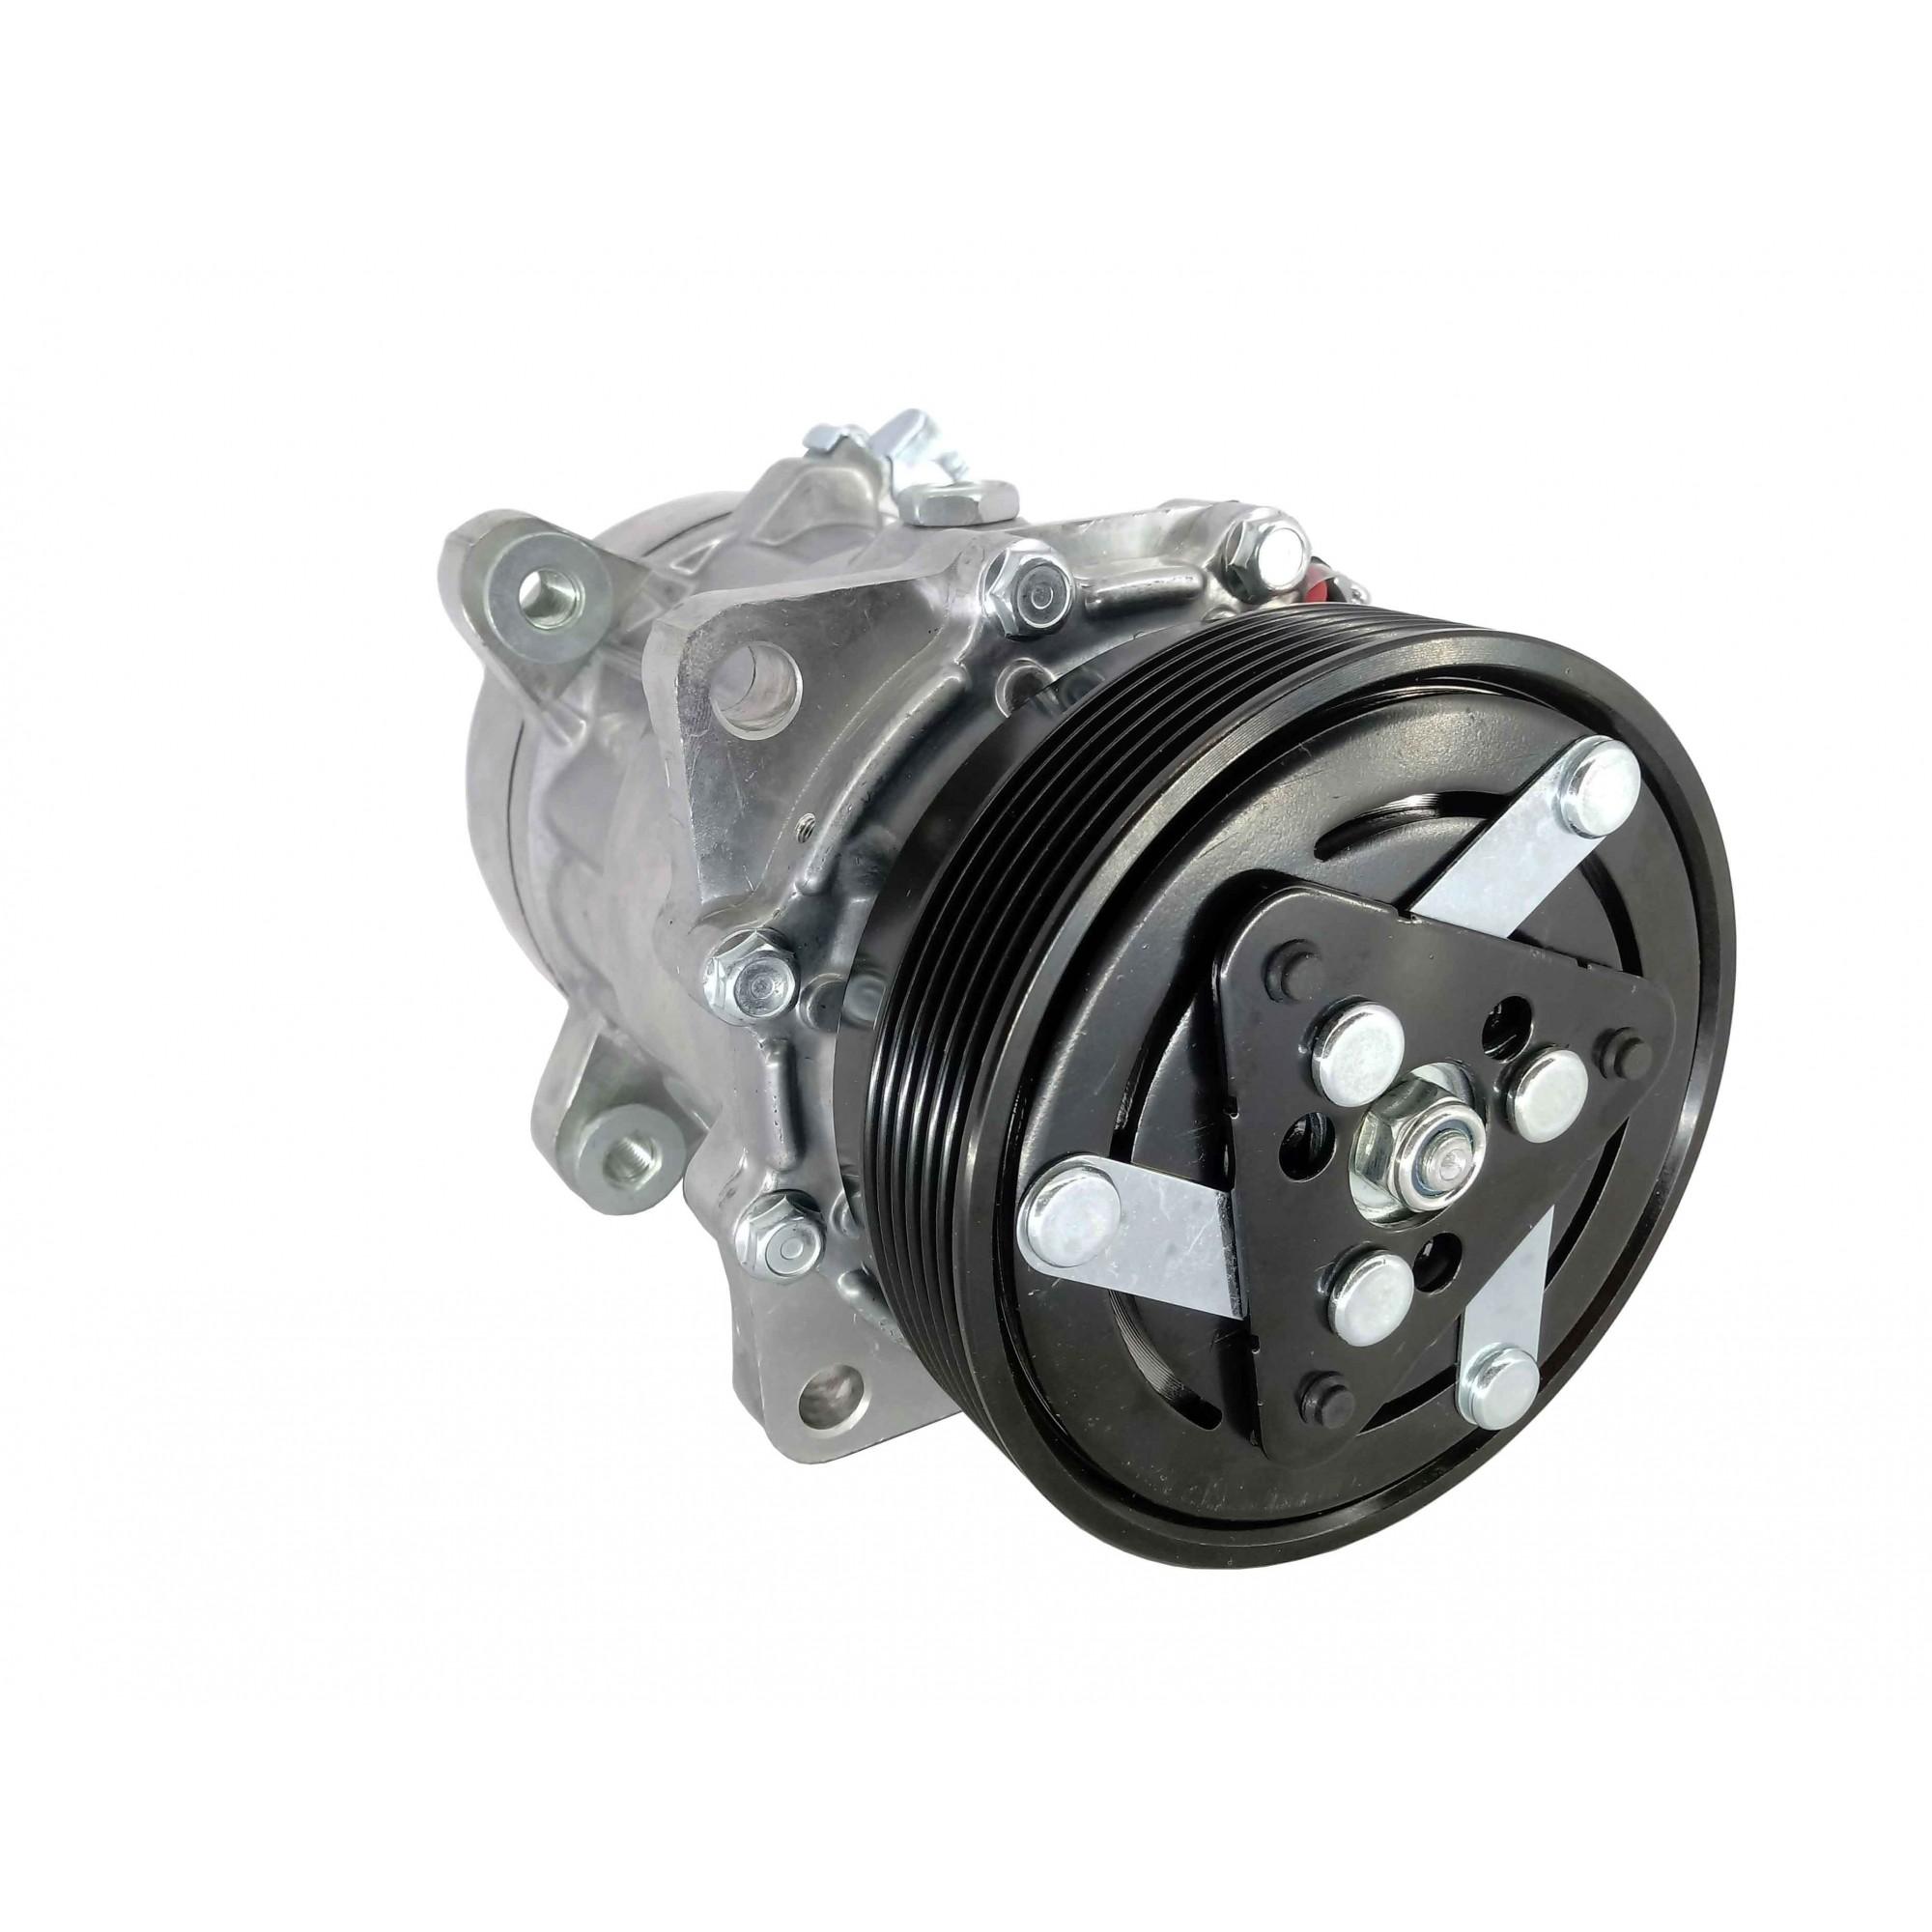 Compressor Golf / Bora / Audi - Substitui DELPHI e MAHLE